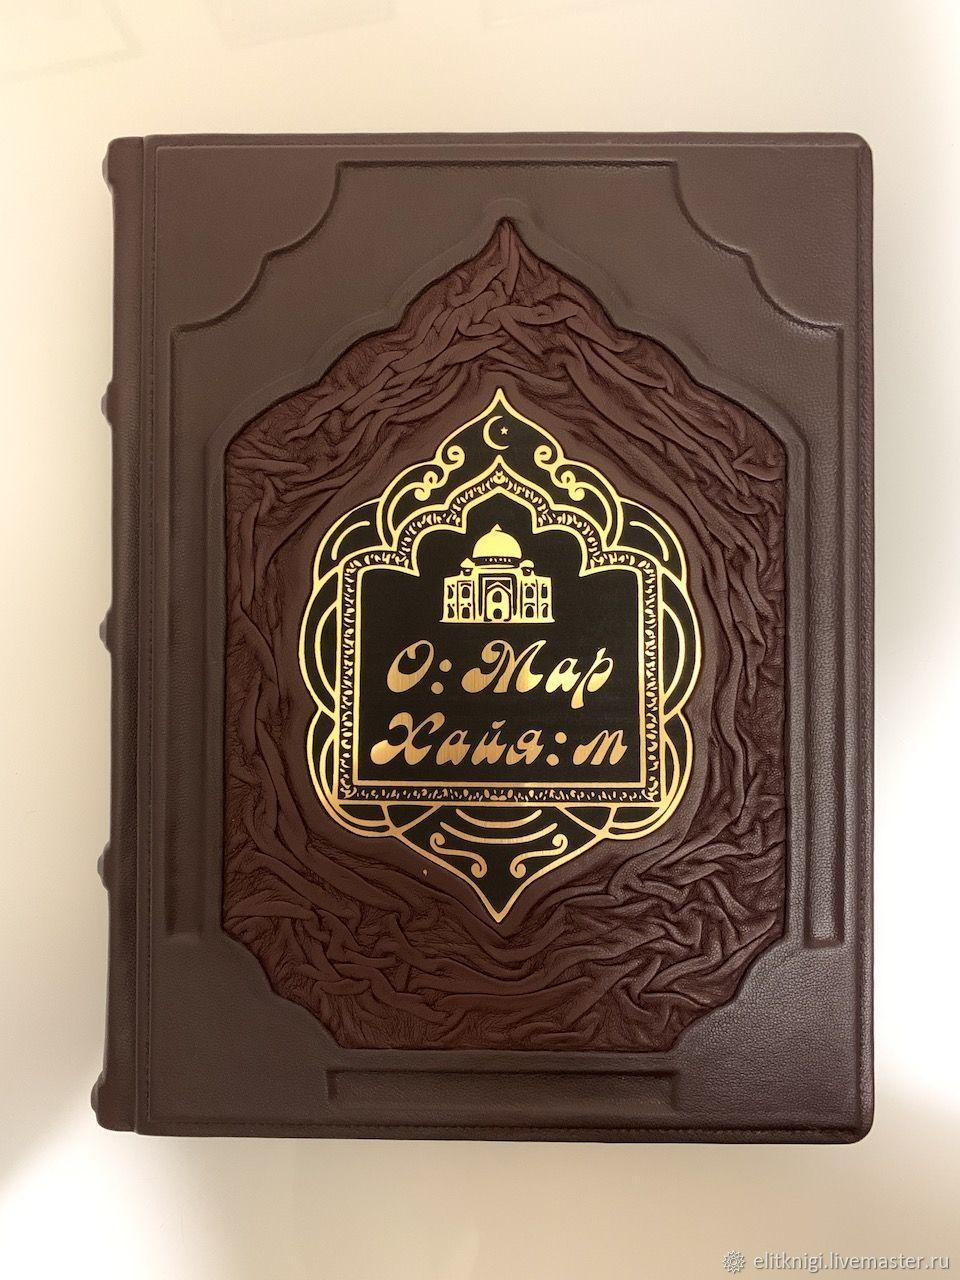 Rubaiyat. Omar Khayyam (Leather Gift Book), Gift books, Moscow,  Фото №1